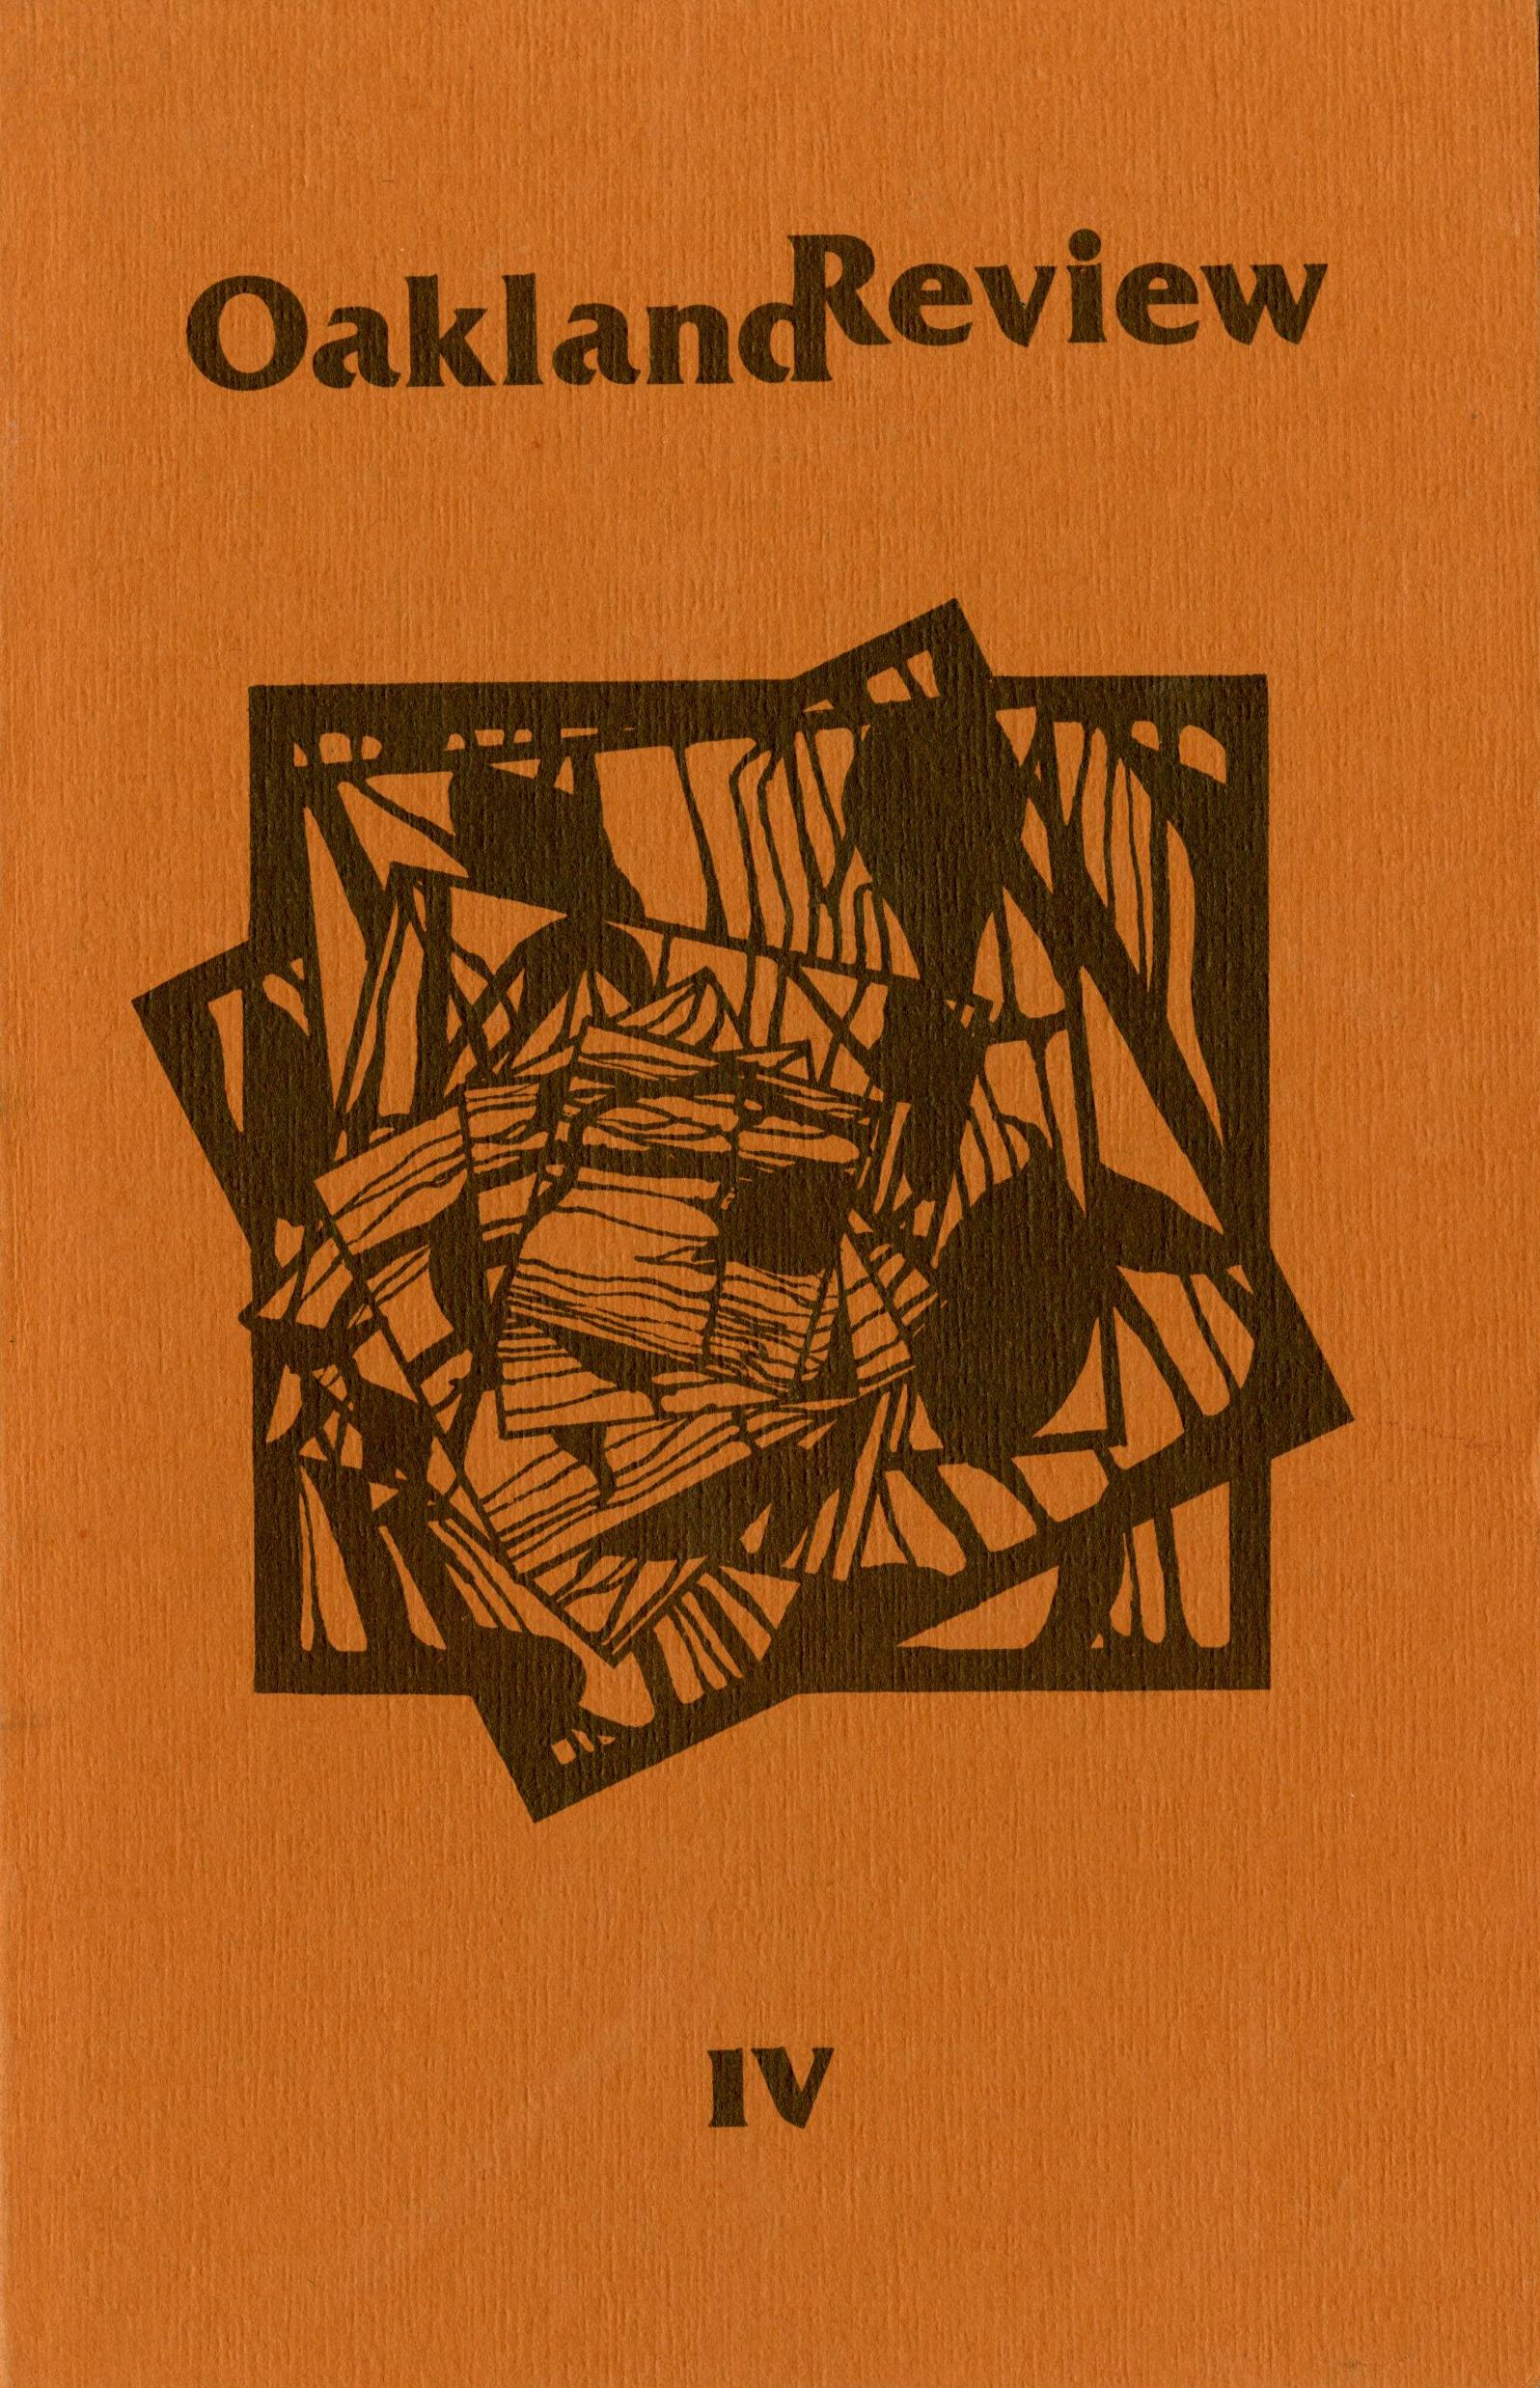 Volume IV, Front (1976)